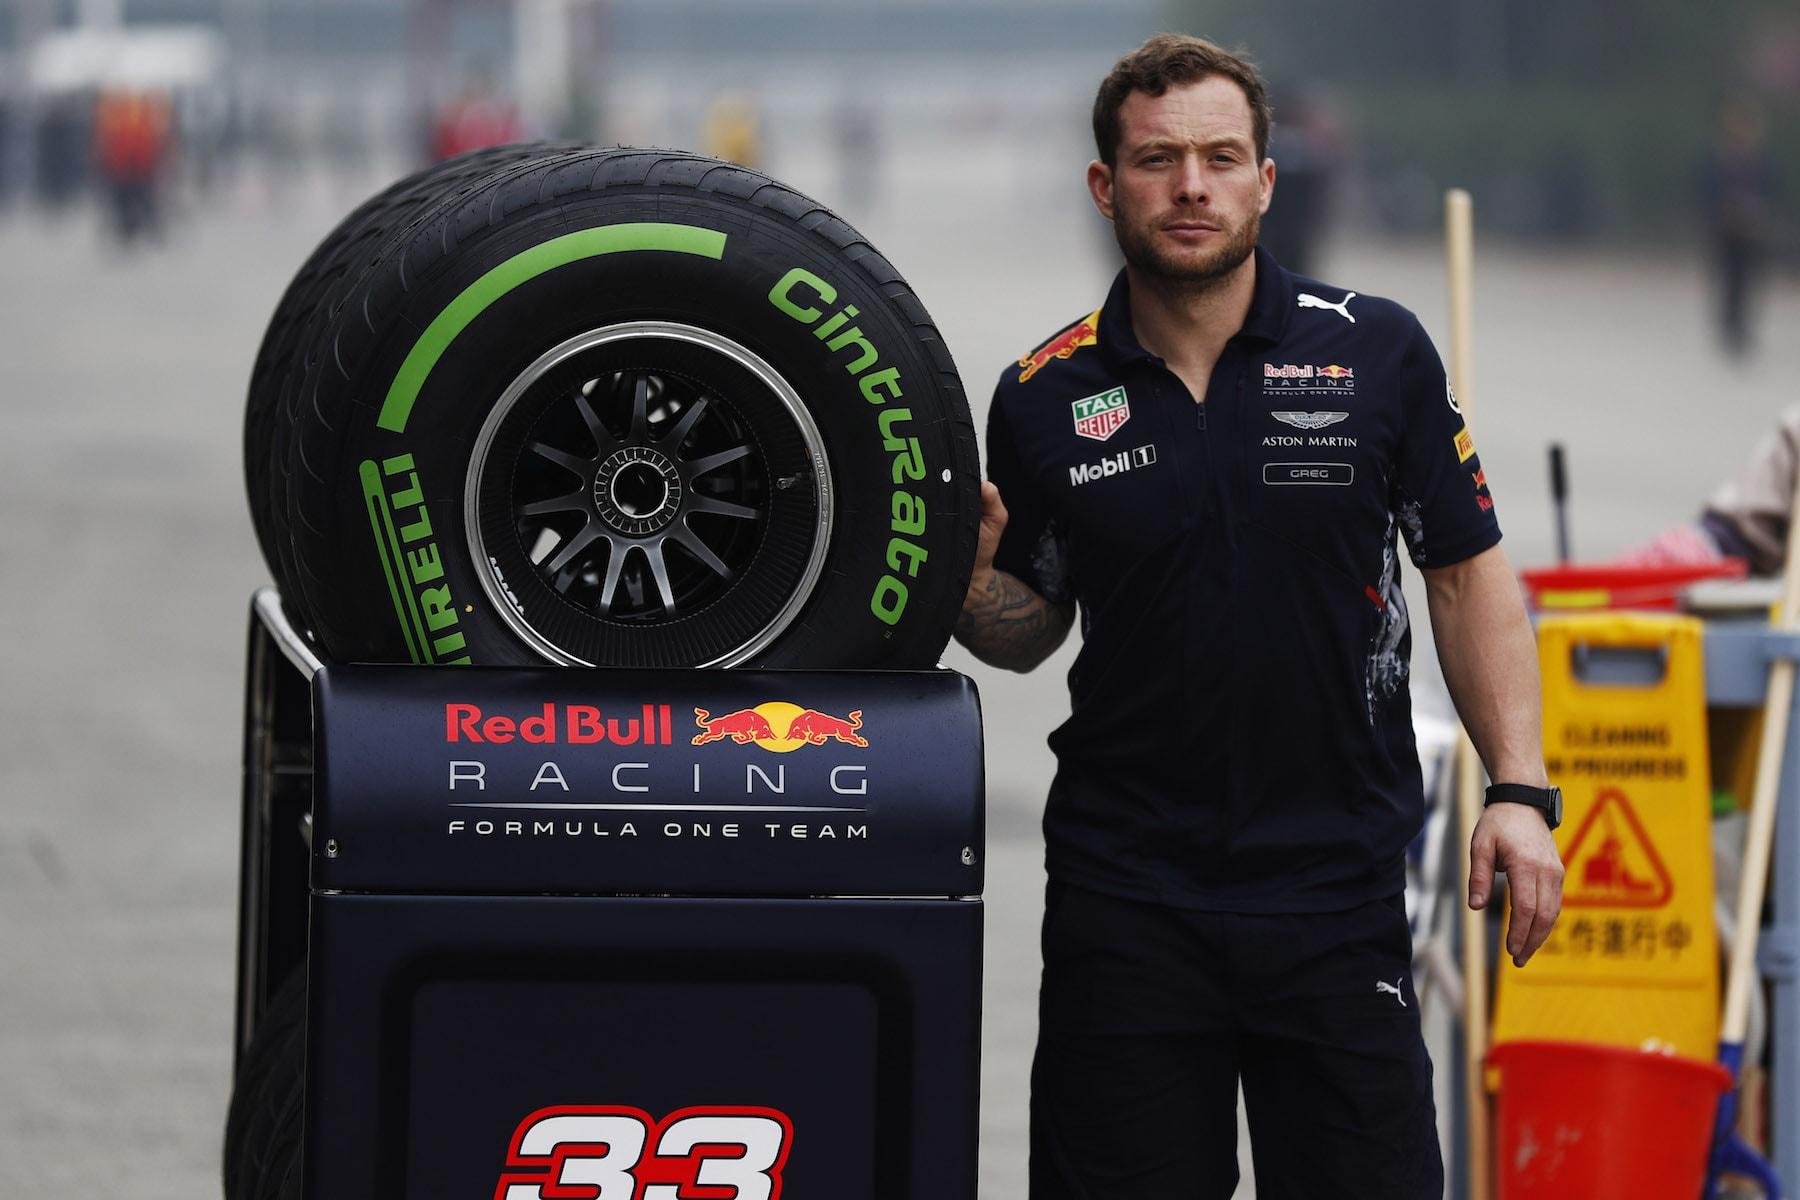 2017 Pirelli Intermediate tire being pulled by RBR mechanic | 2017 Chinese GP copy.jpg